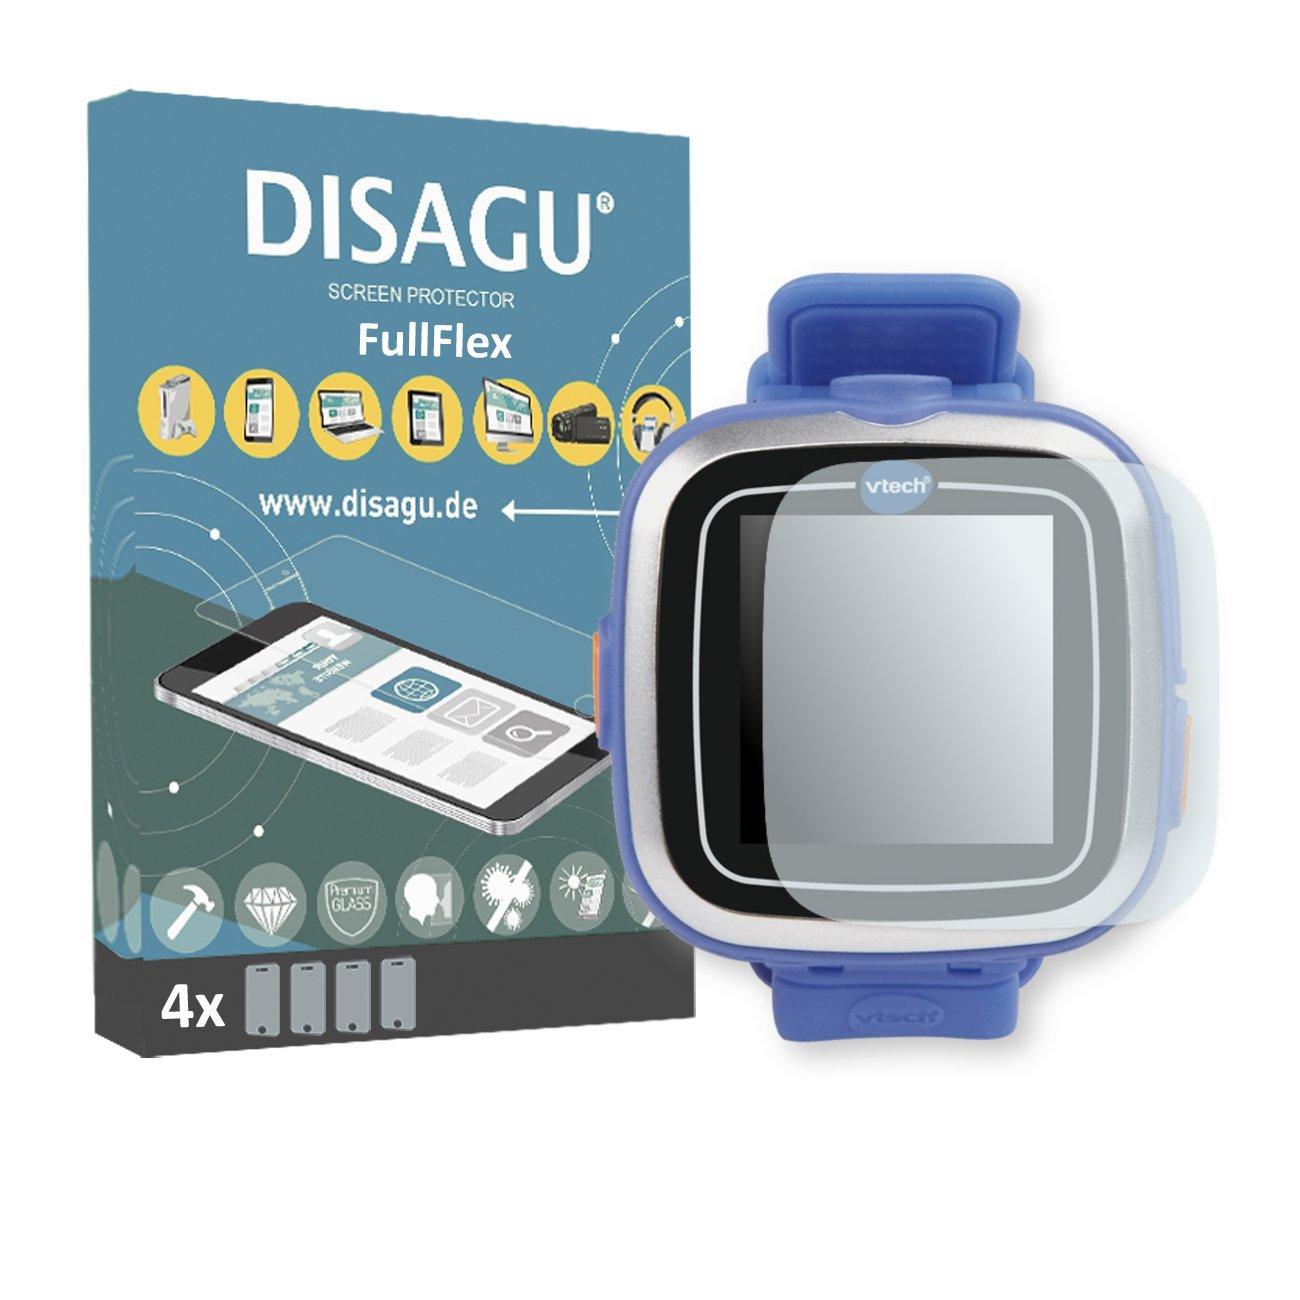 DISAGU 4 x FullFlex screen protector for Vtech Kidizoom Smart Watch 1 foil screen protector